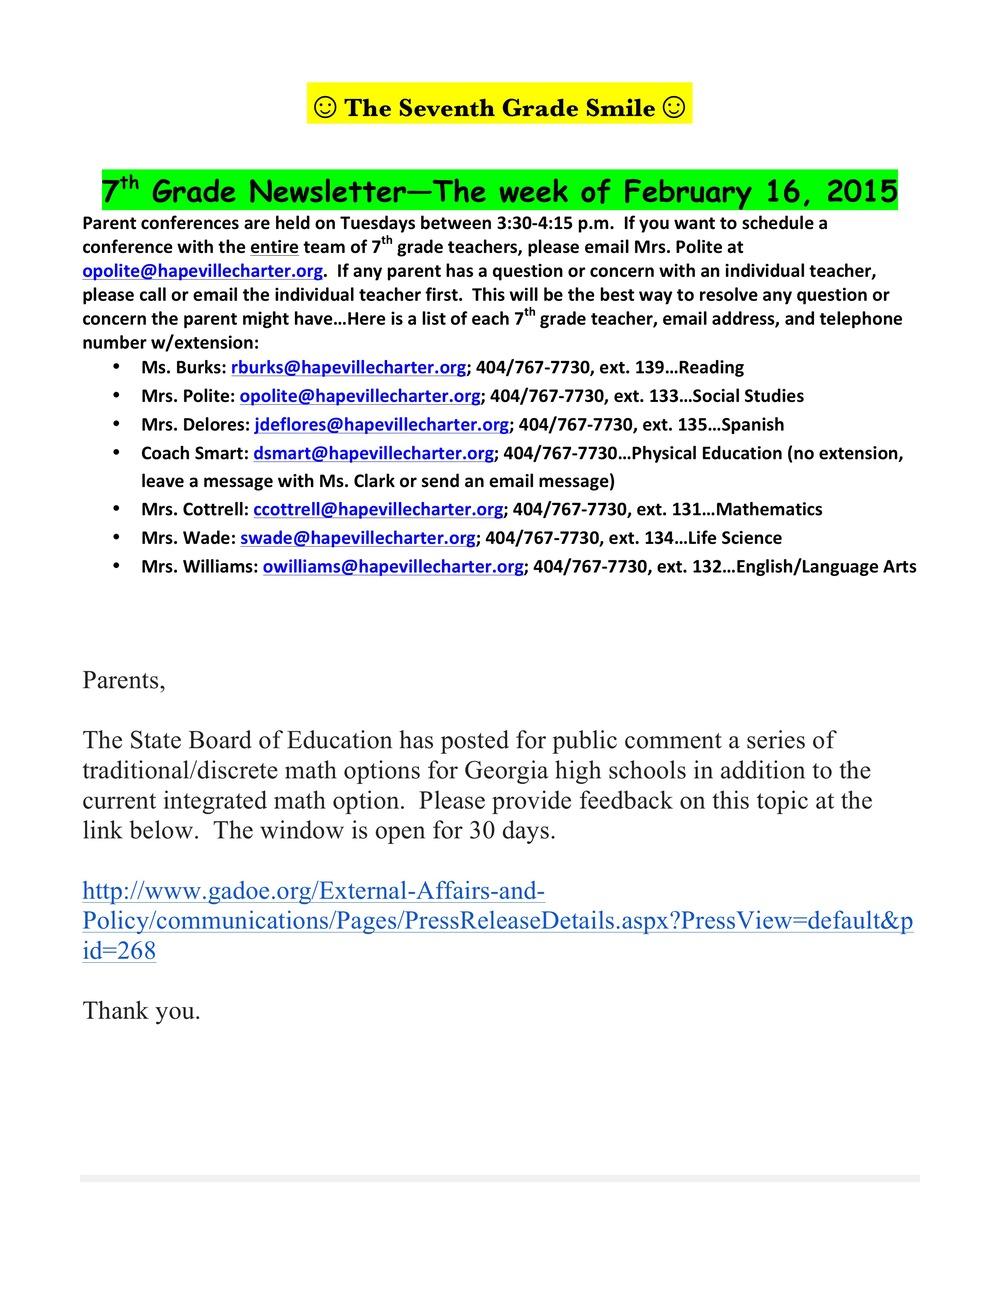 Newsletter Image7th grade feb 16th.jpeg